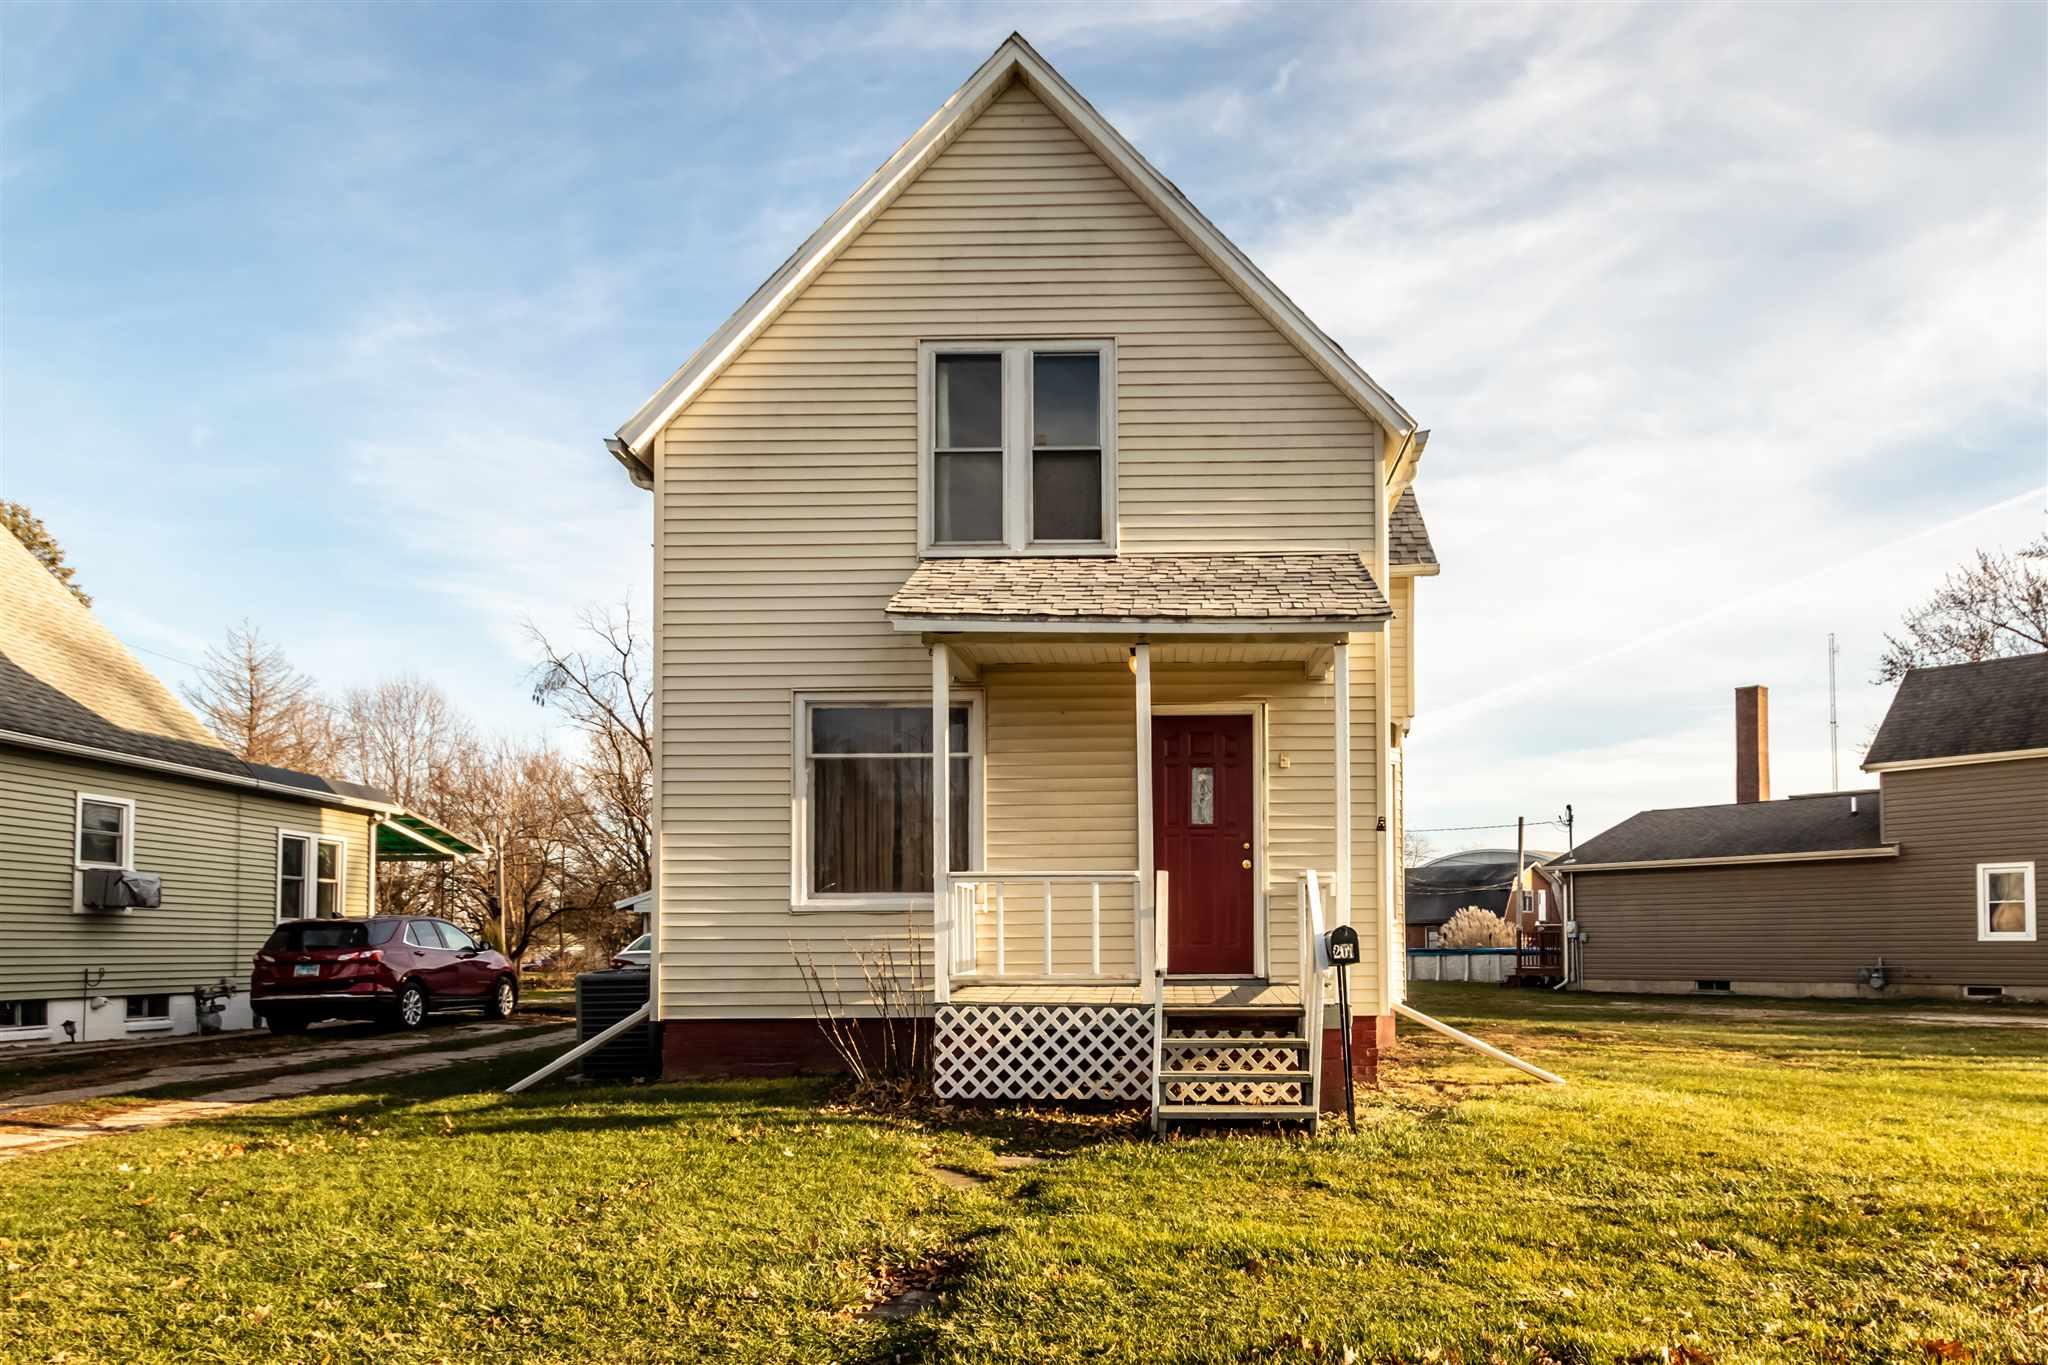 201 DIAGONAL Property Photo - Wyoming, IL real estate listing